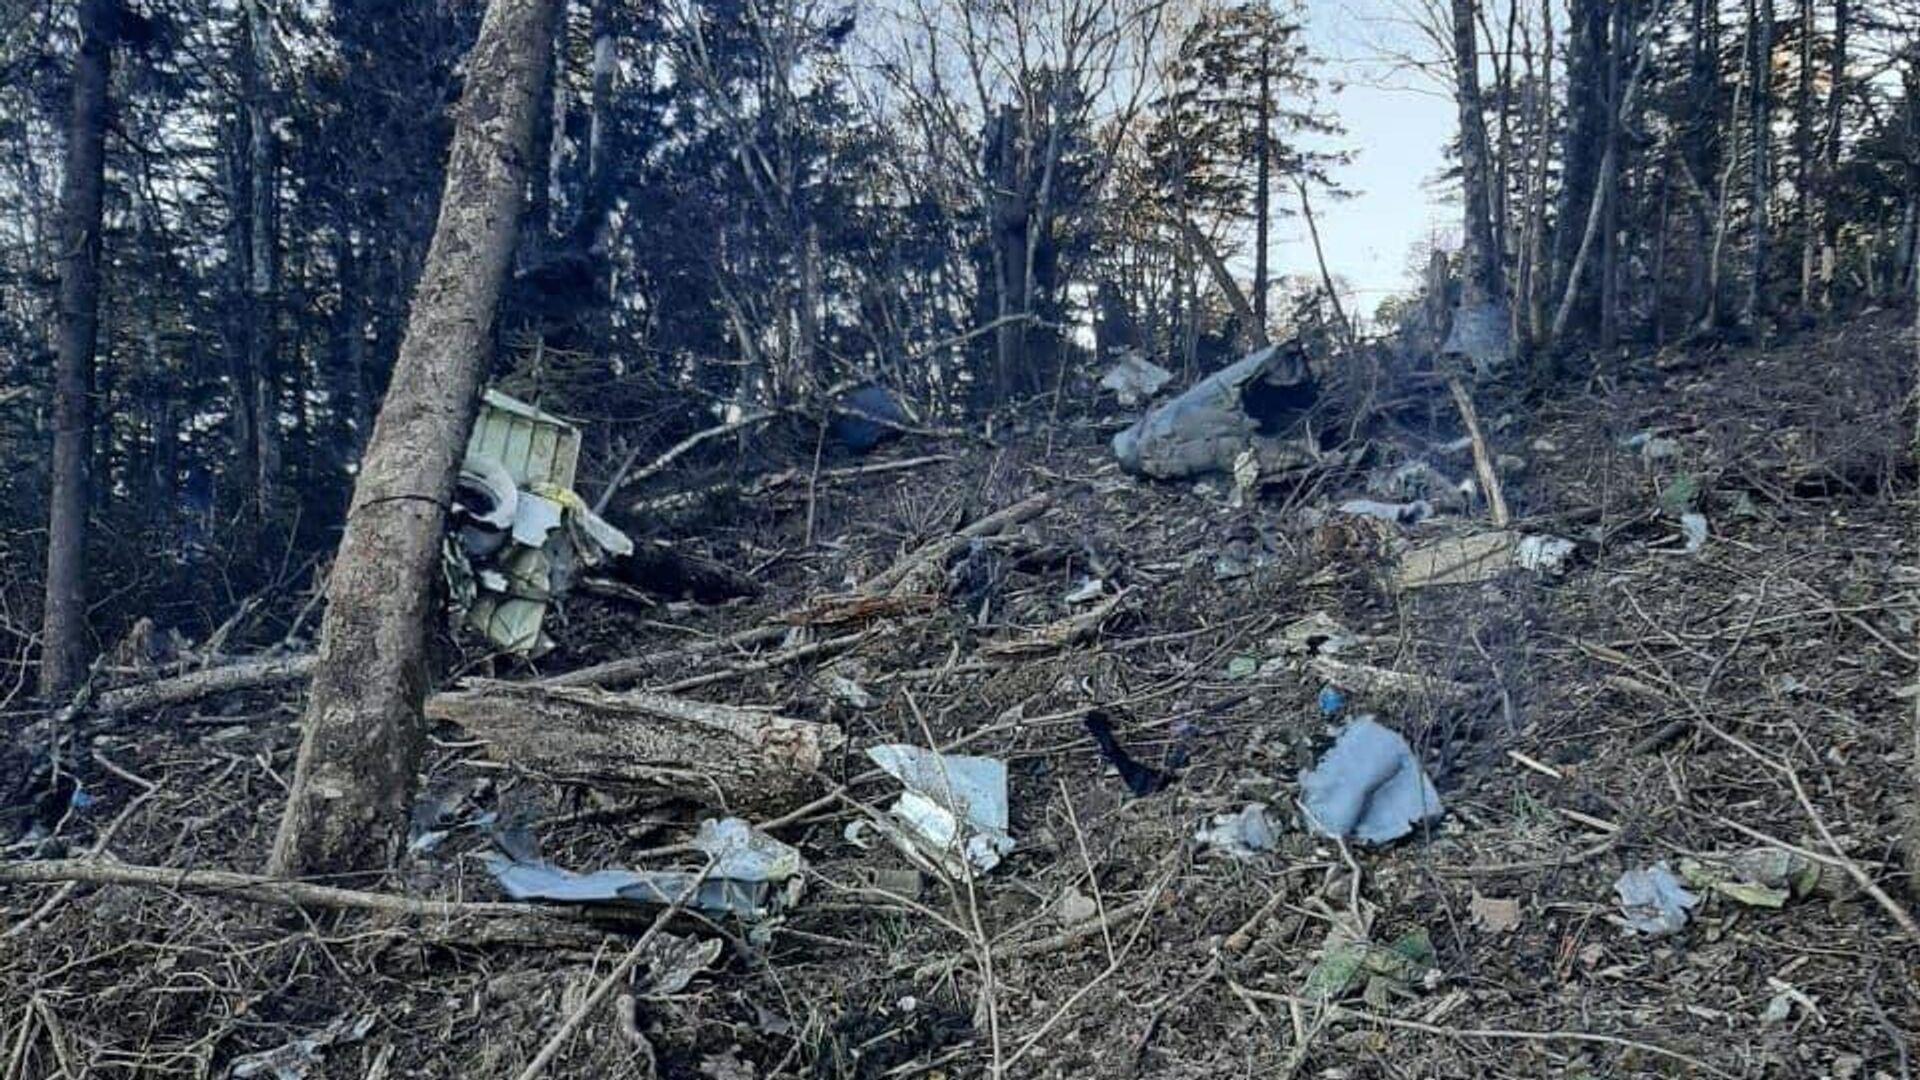 1751431689 0:285:960:825 1920x0 80 0 0 b9eb791490ccc2ab192ffe1b8d999d8b - Следователи обнаружили бортовые самописцы Ан-26, разбившегося в Хабаровском крае